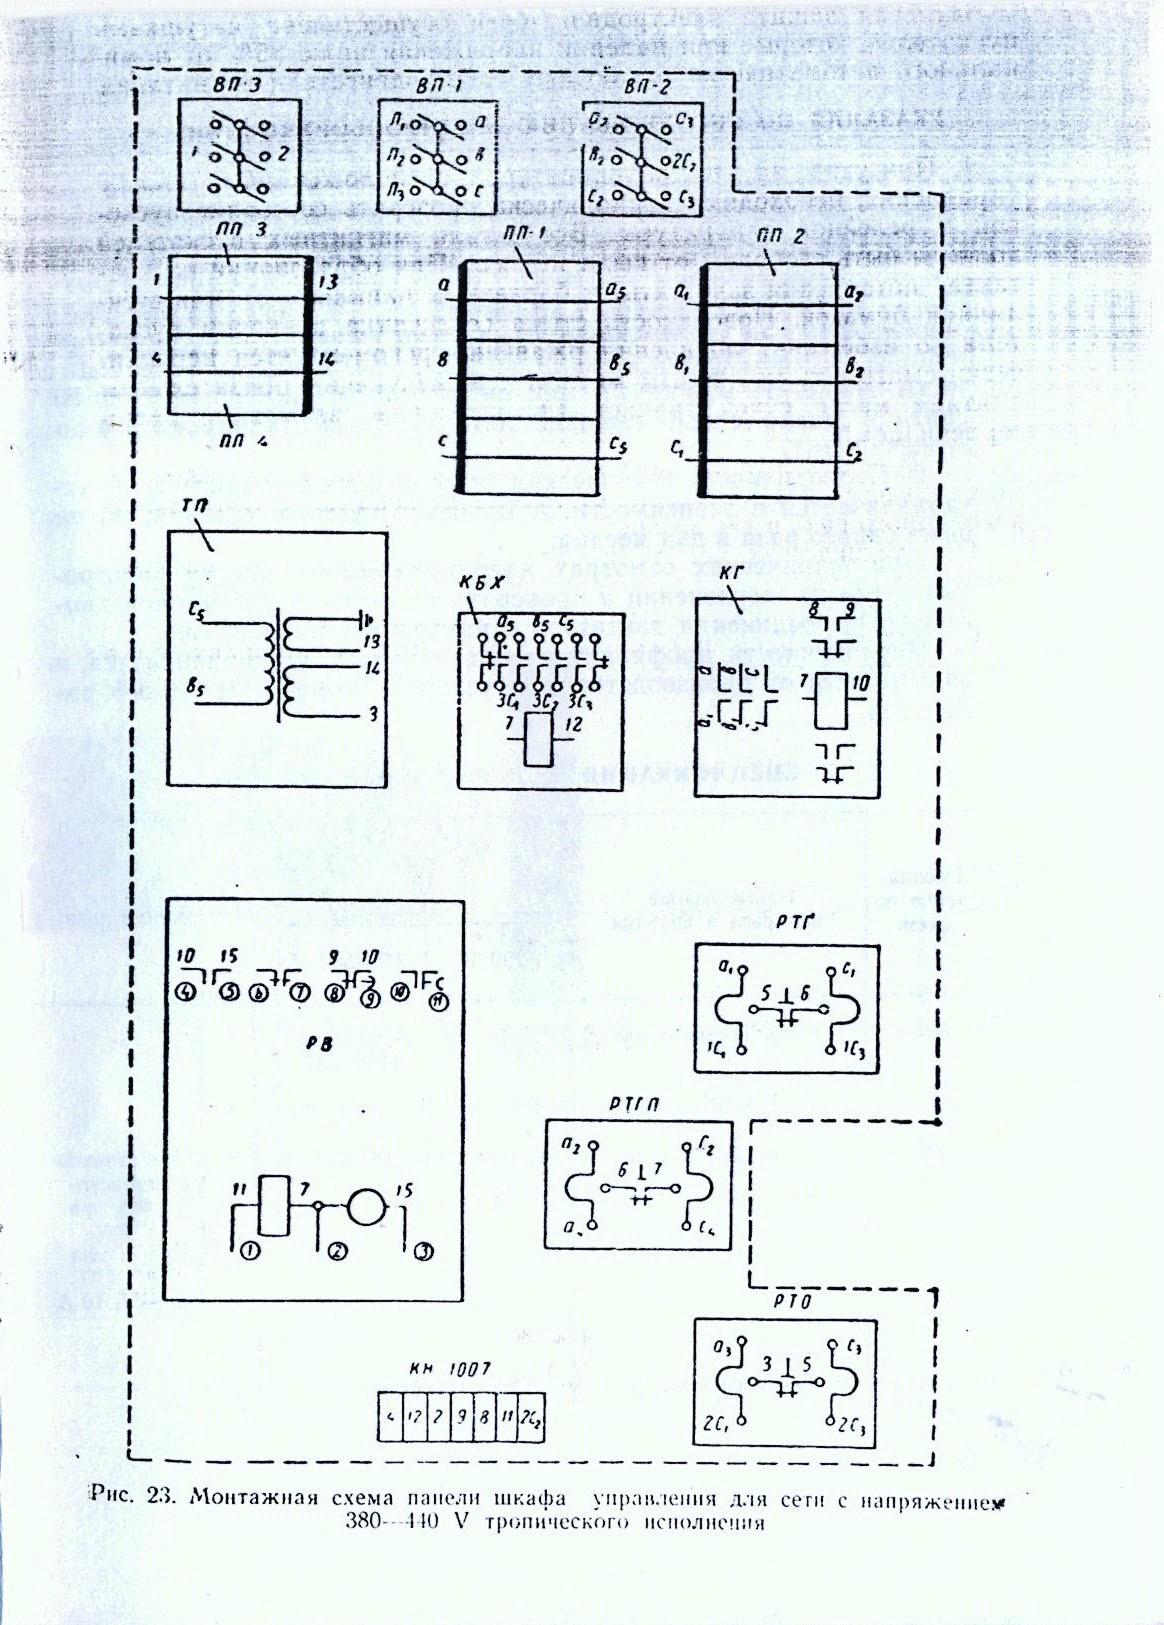 Электросхема токарного станка 16б16кп